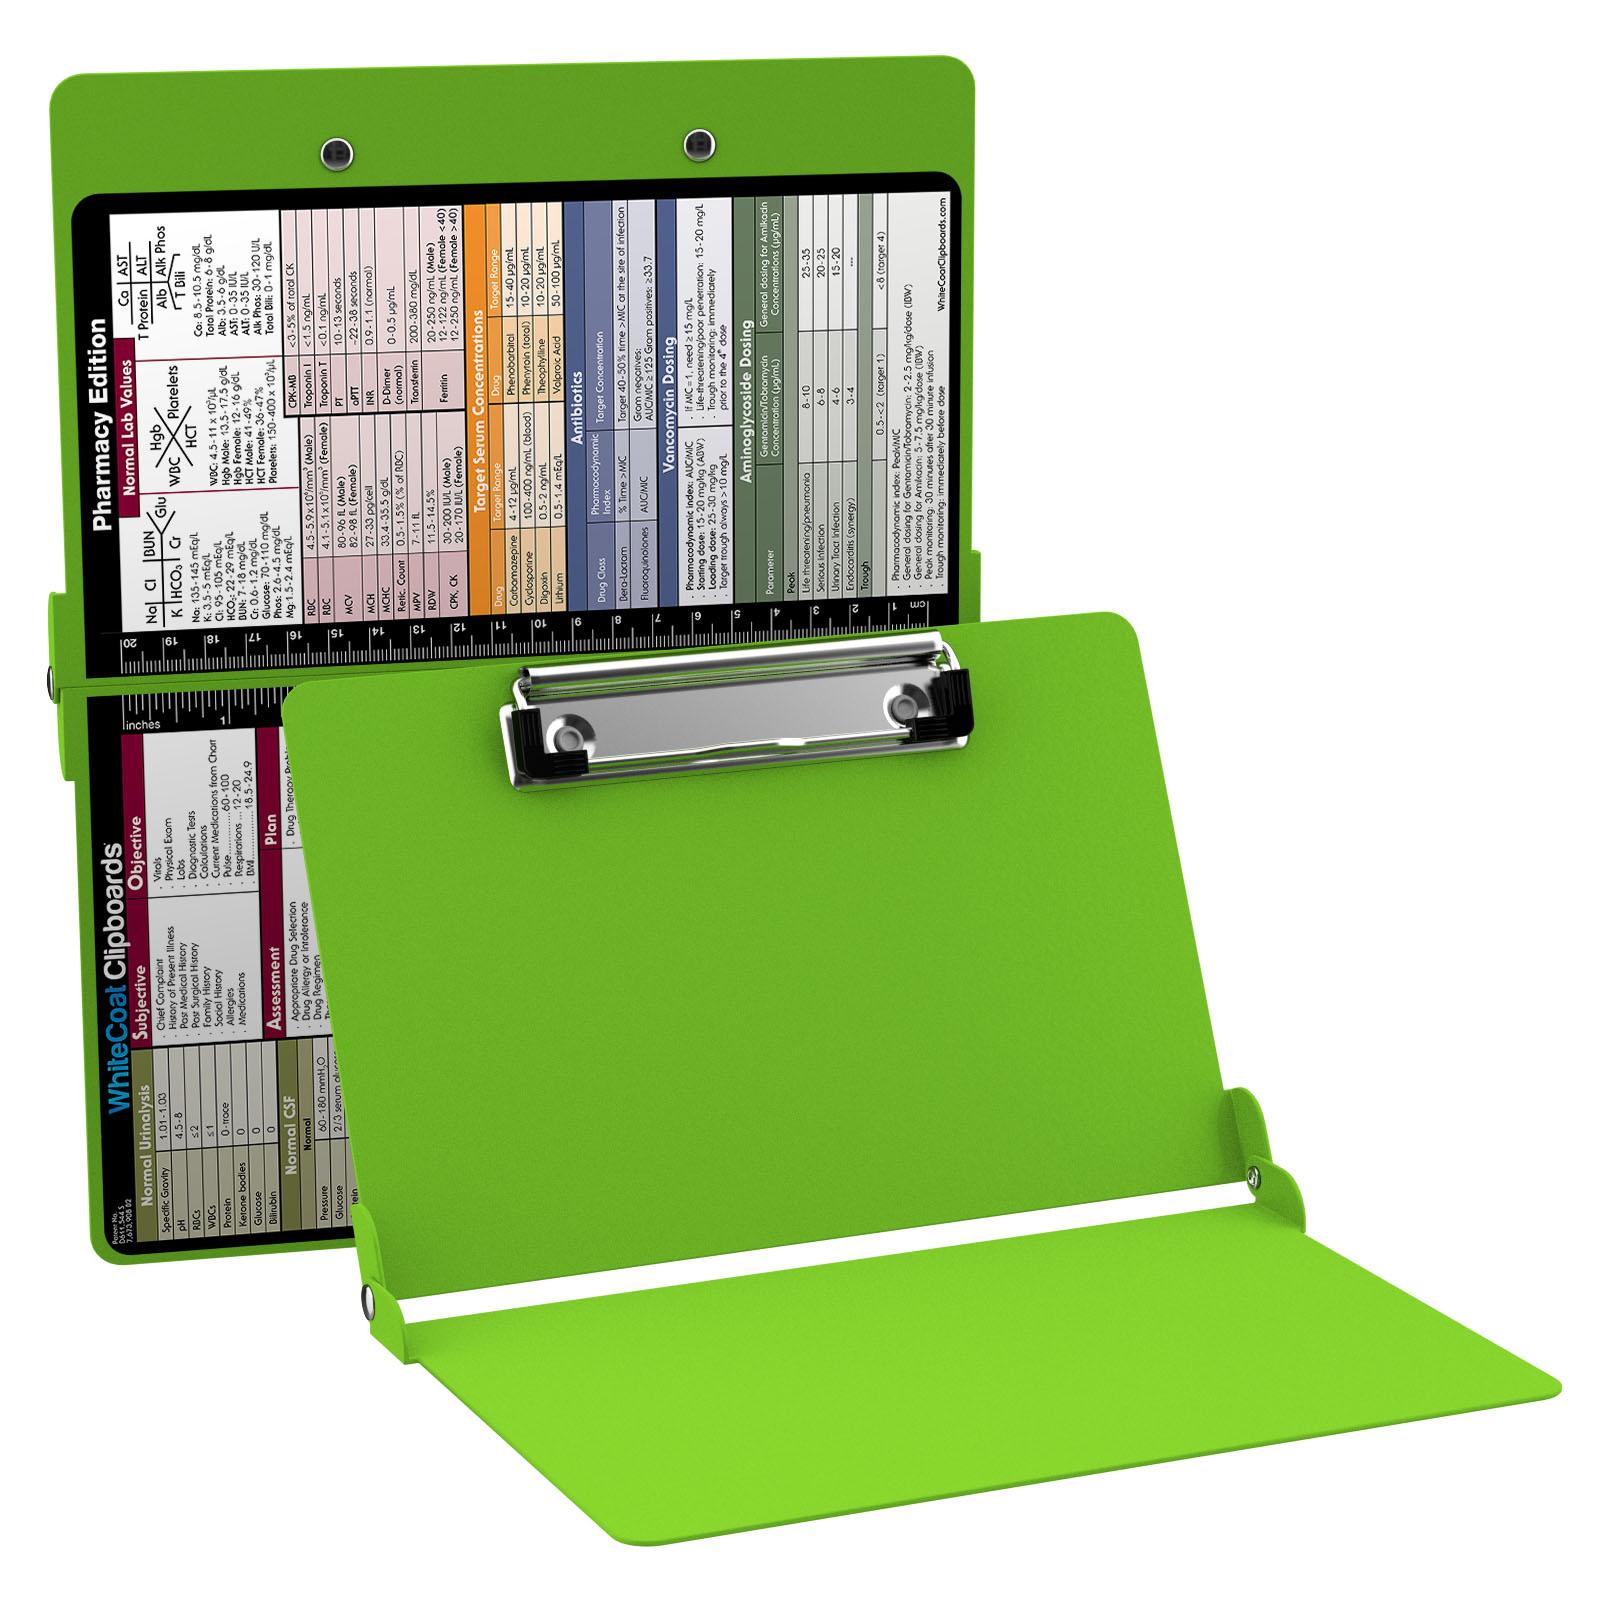 e2745fb0a1f4 WhiteCoat Clipboard - LIME GREEN - Pharmacy Edition